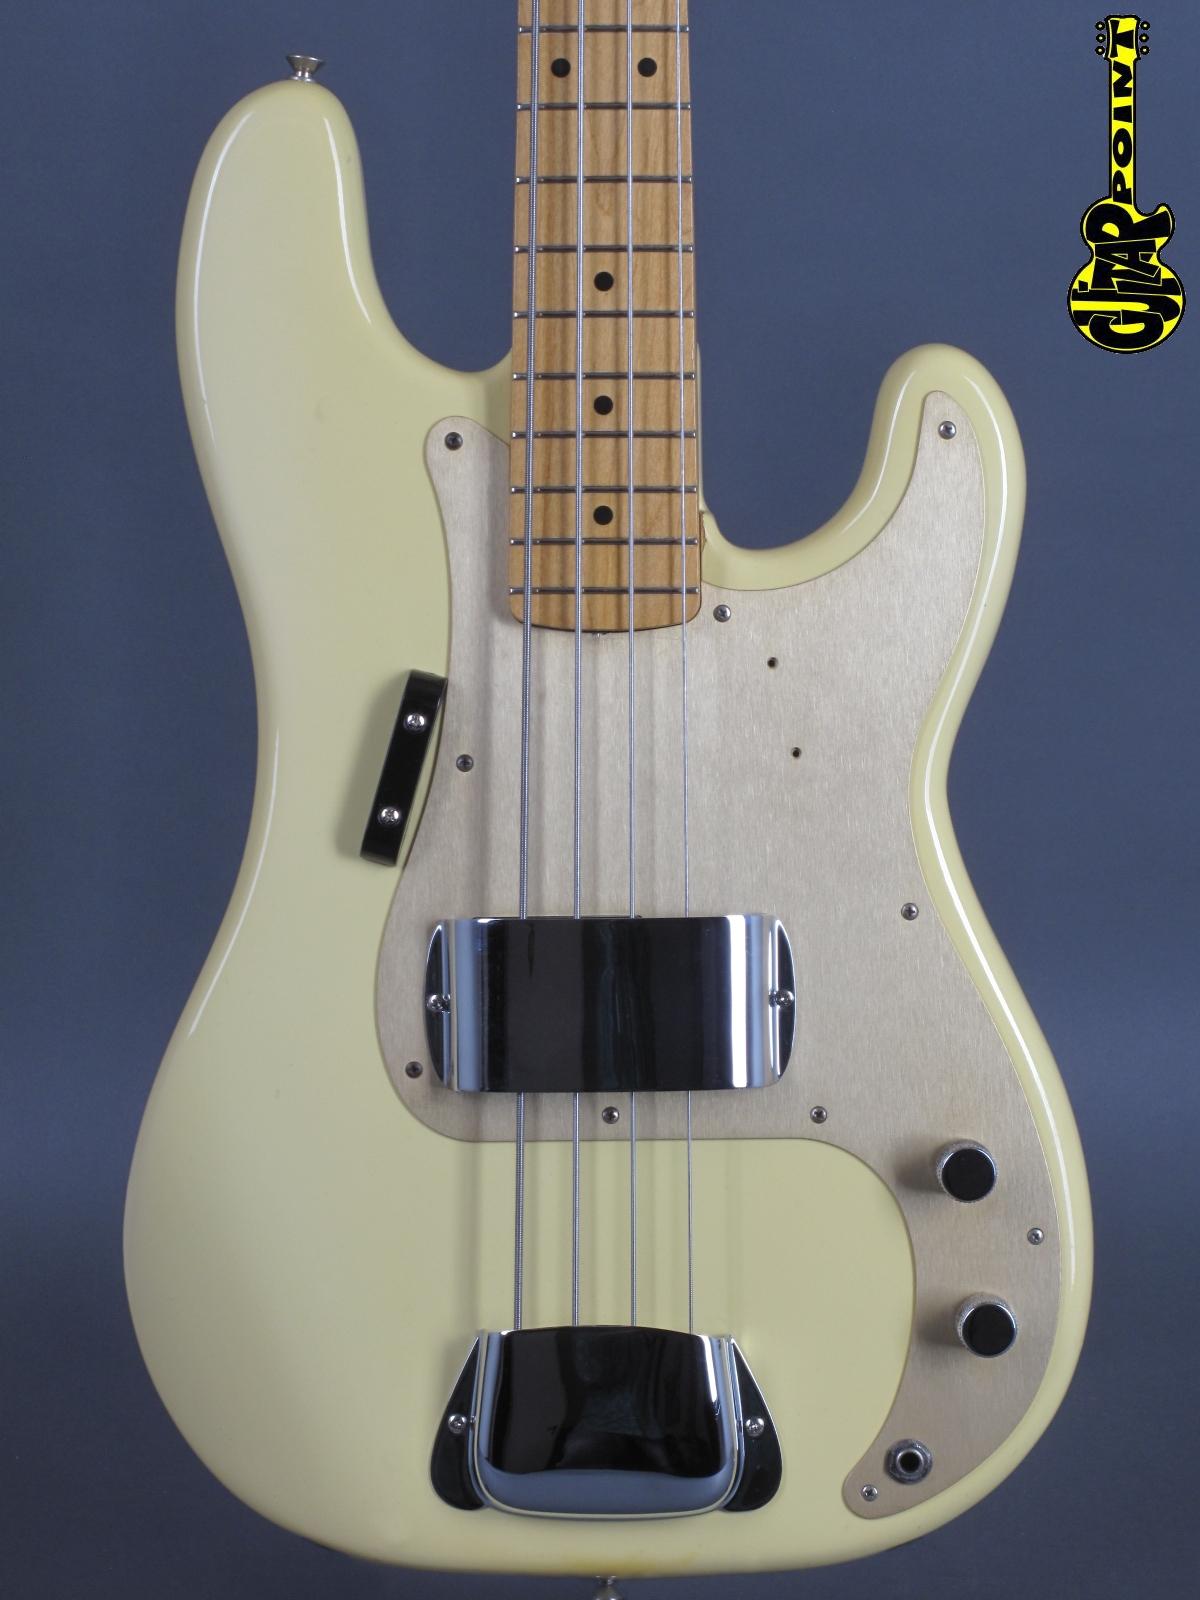 1982 fender 57 precision bass olympic white fullerton vintage reissue vi82fe57pbriow v006669. Black Bedroom Furniture Sets. Home Design Ideas